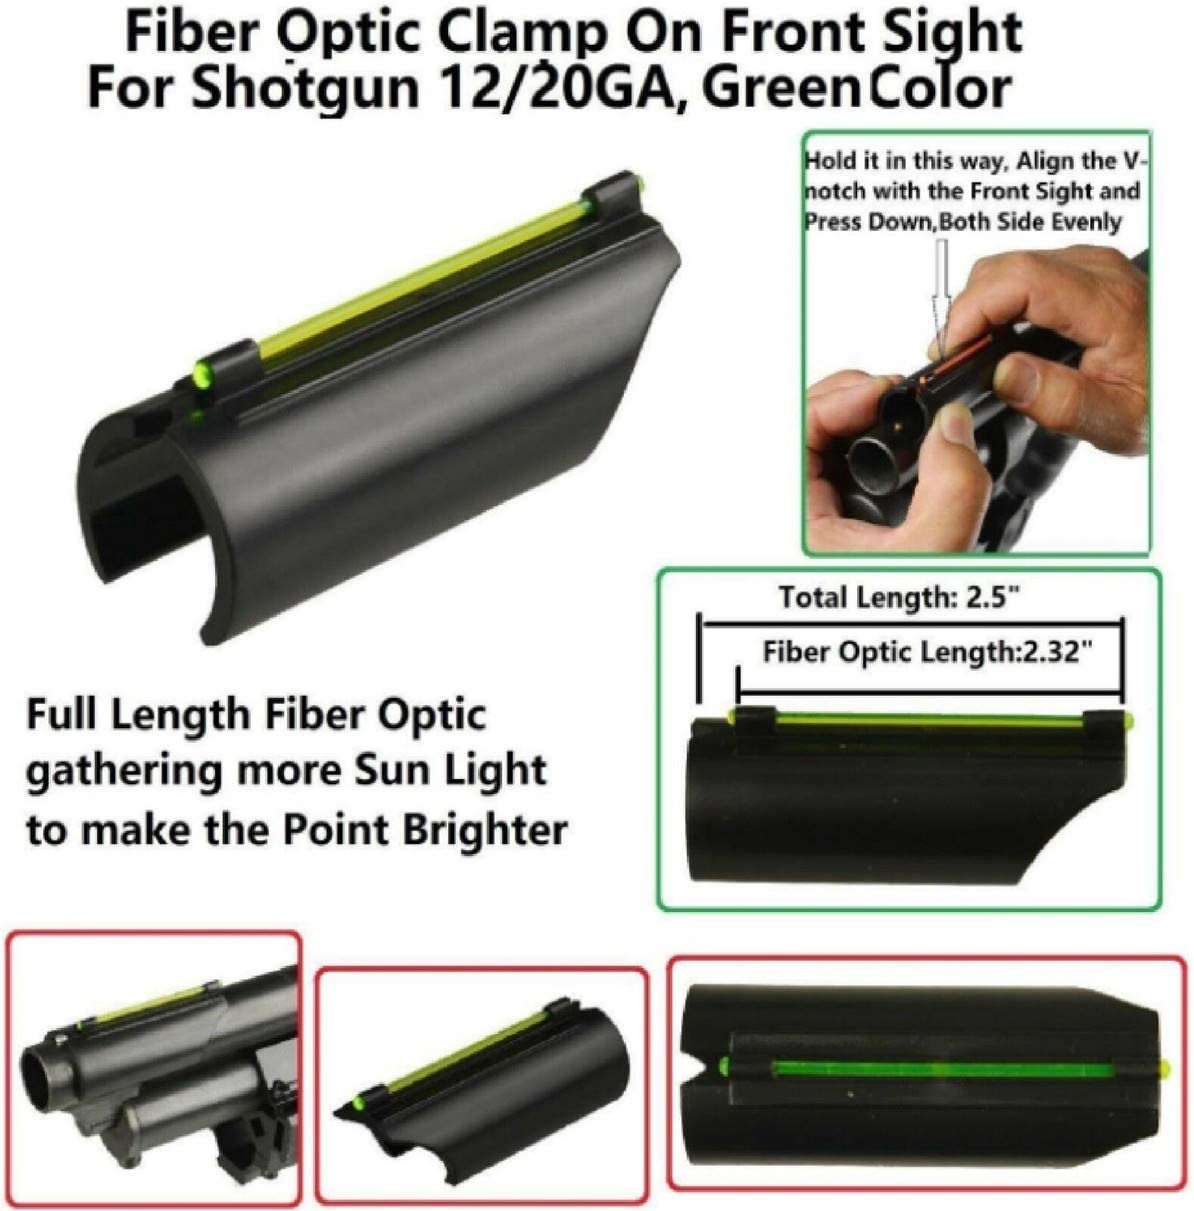 ARWIN Fiber Optic Universal Red Green Sight 12//20 Gauge TG92HA Home Defense